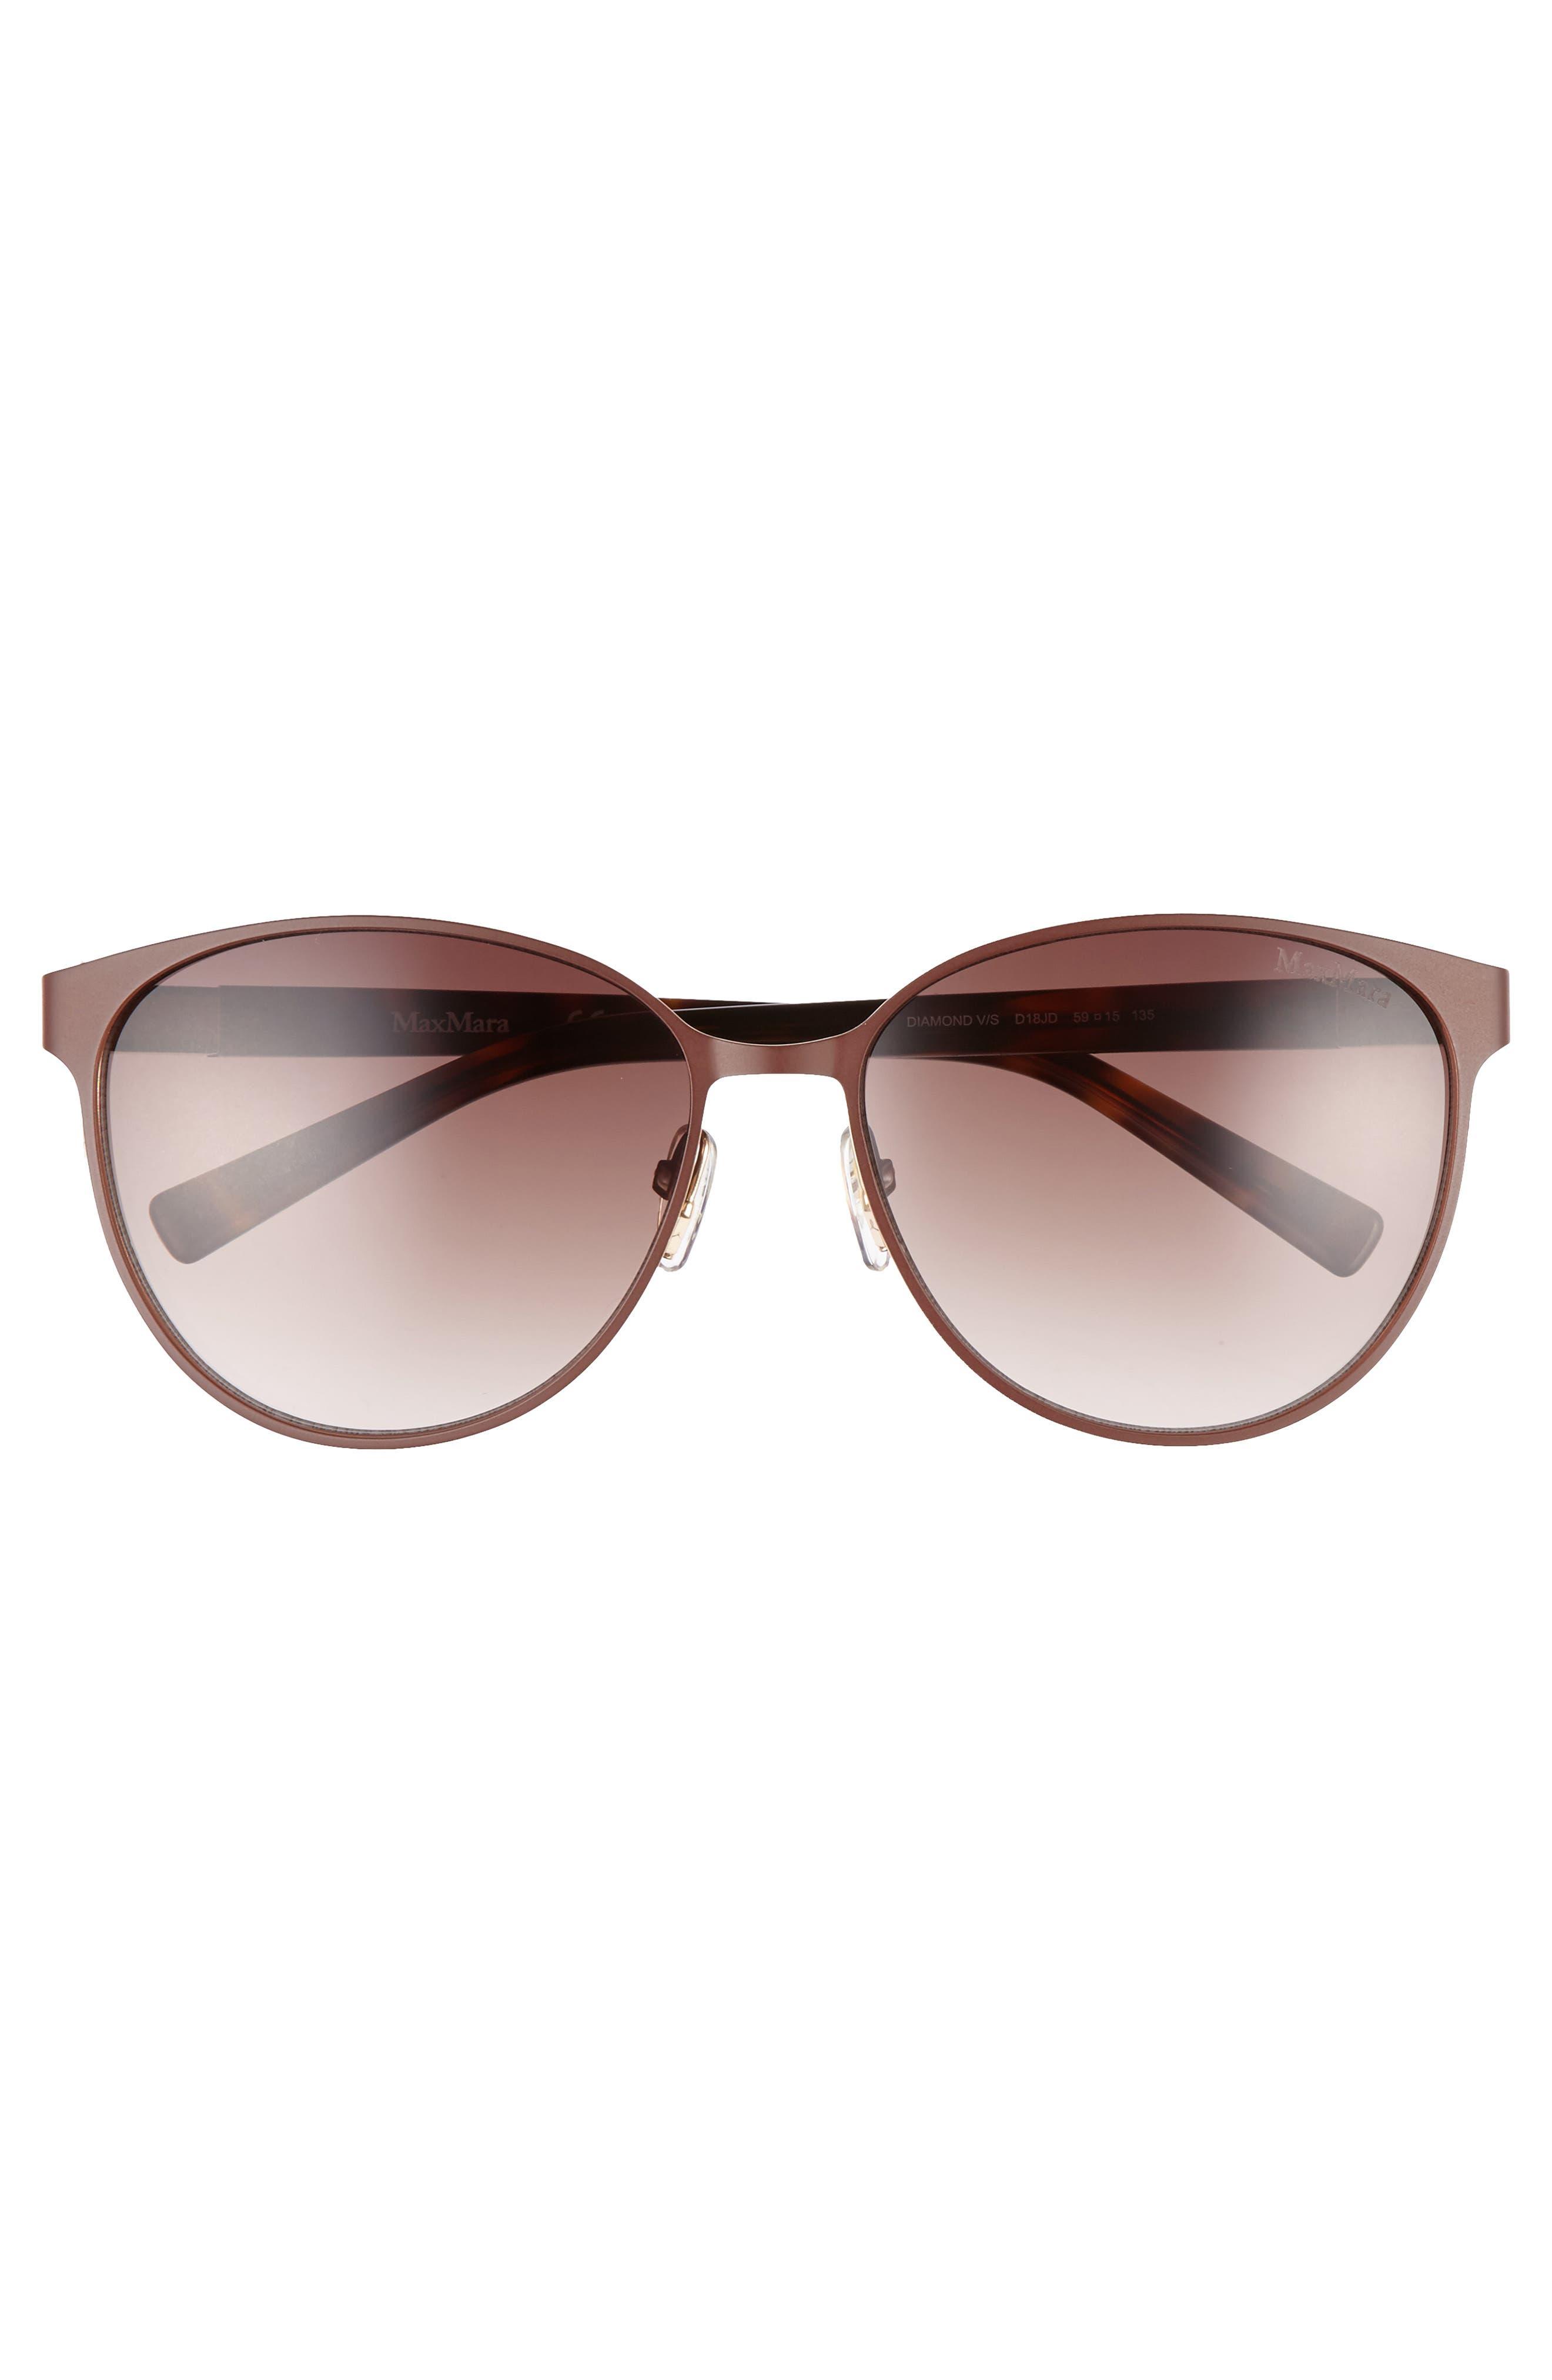 Diamov 59mm Gradient Cat Eye Sunglasses,                             Alternate thumbnail 3, color,                             Matte Brown